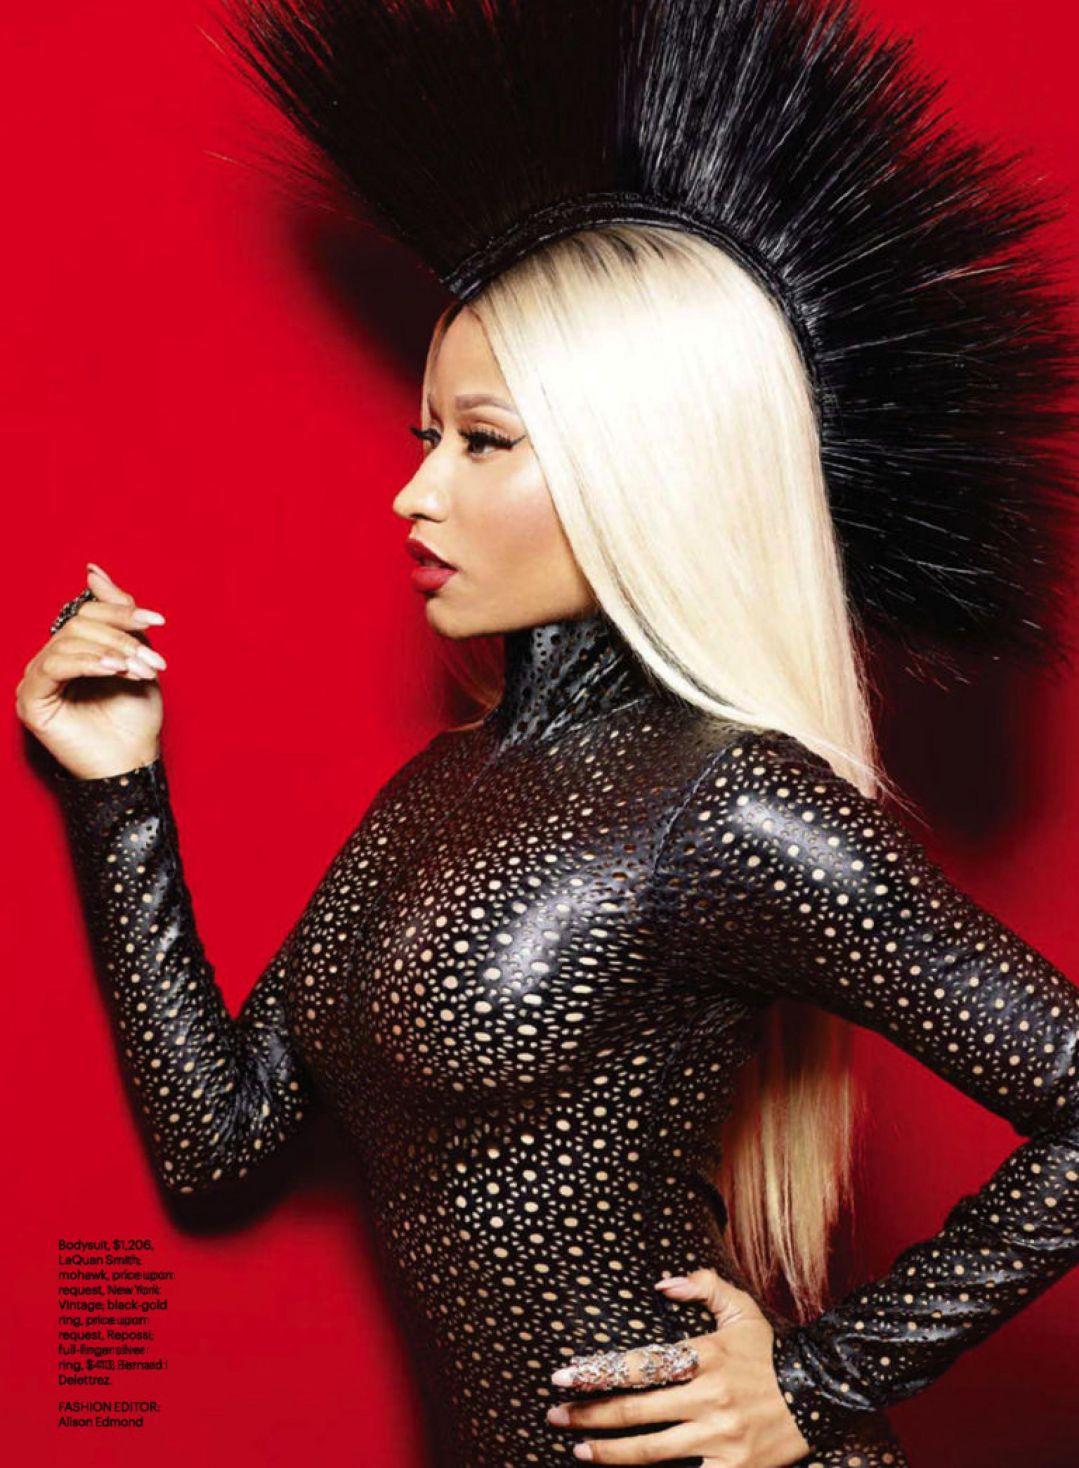 Nicki Minaj Photo 185 Of 418 Pics Wallpaper Photo